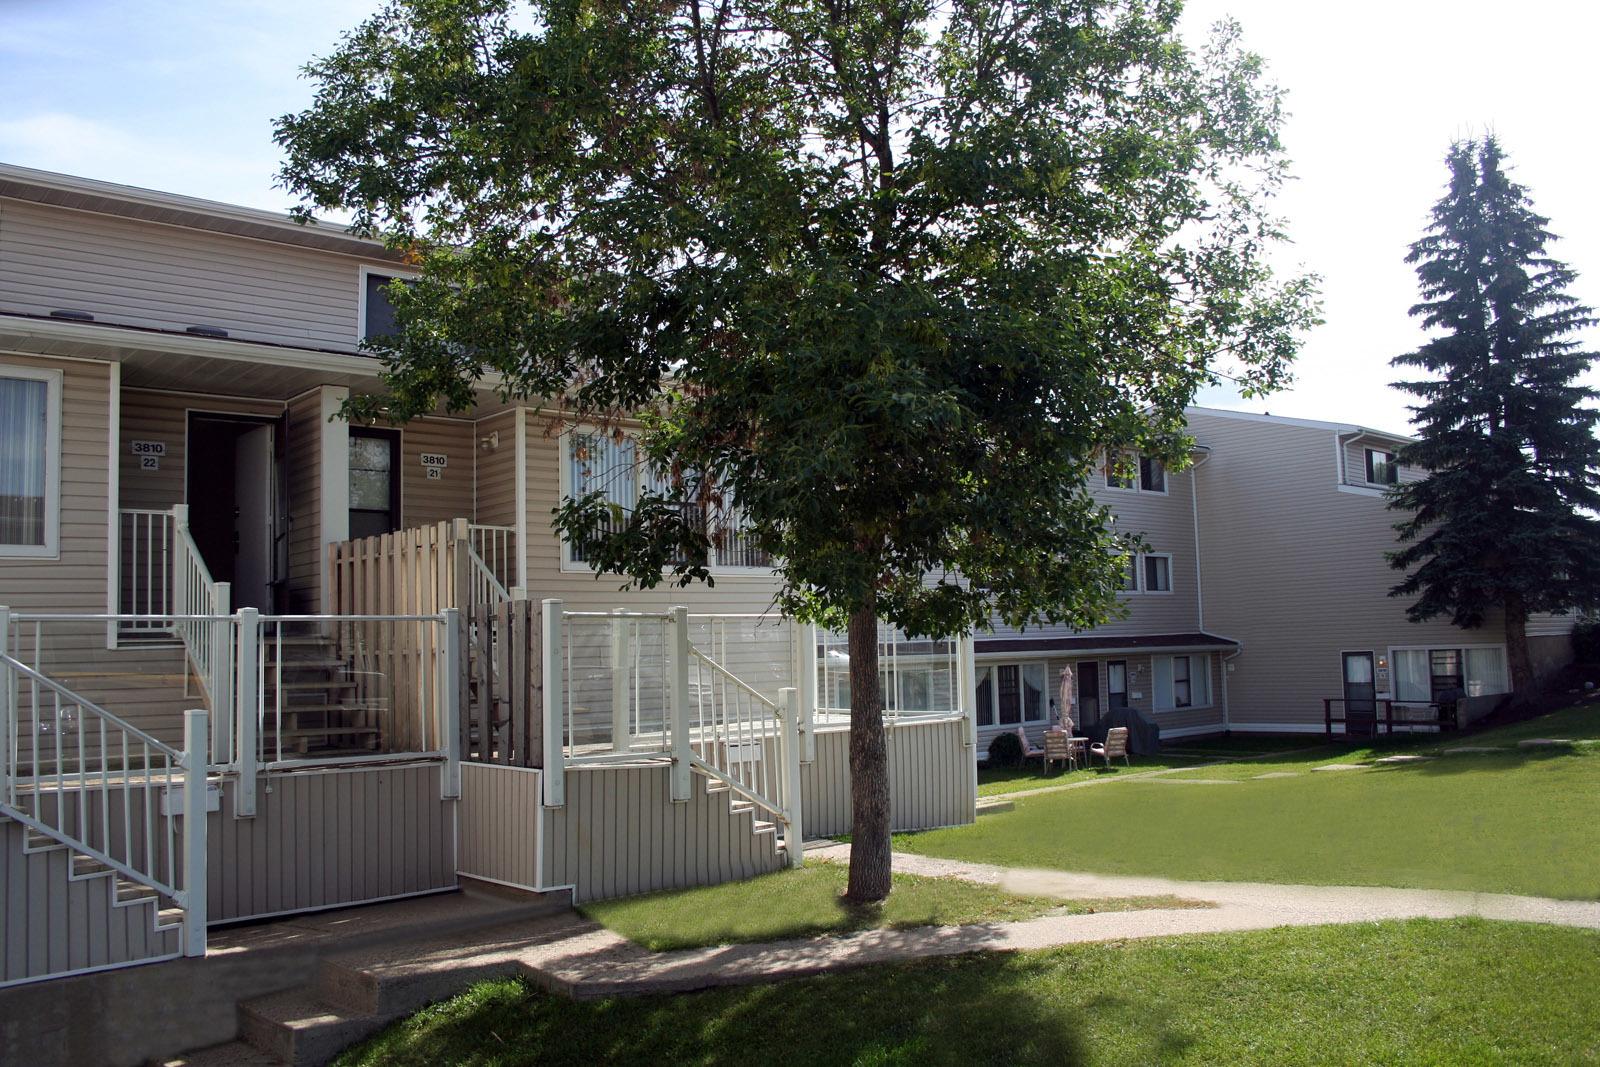 3820 134 Avenue NW, Edmonton, AB - $895